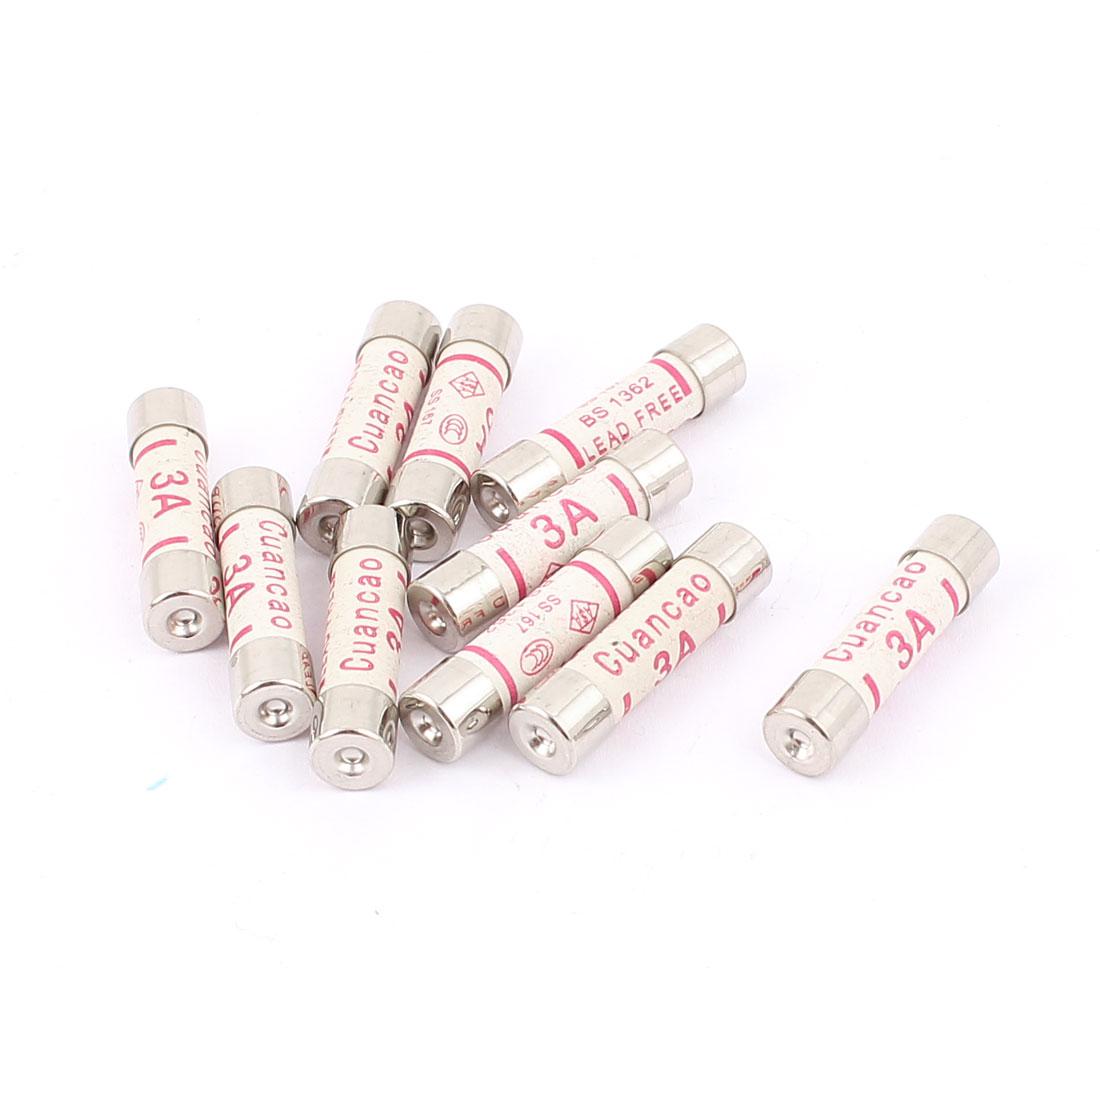 10 Pcs Low Breaking Capacity 6x25mm 3A 250V Cartridge Ceramic Fuses